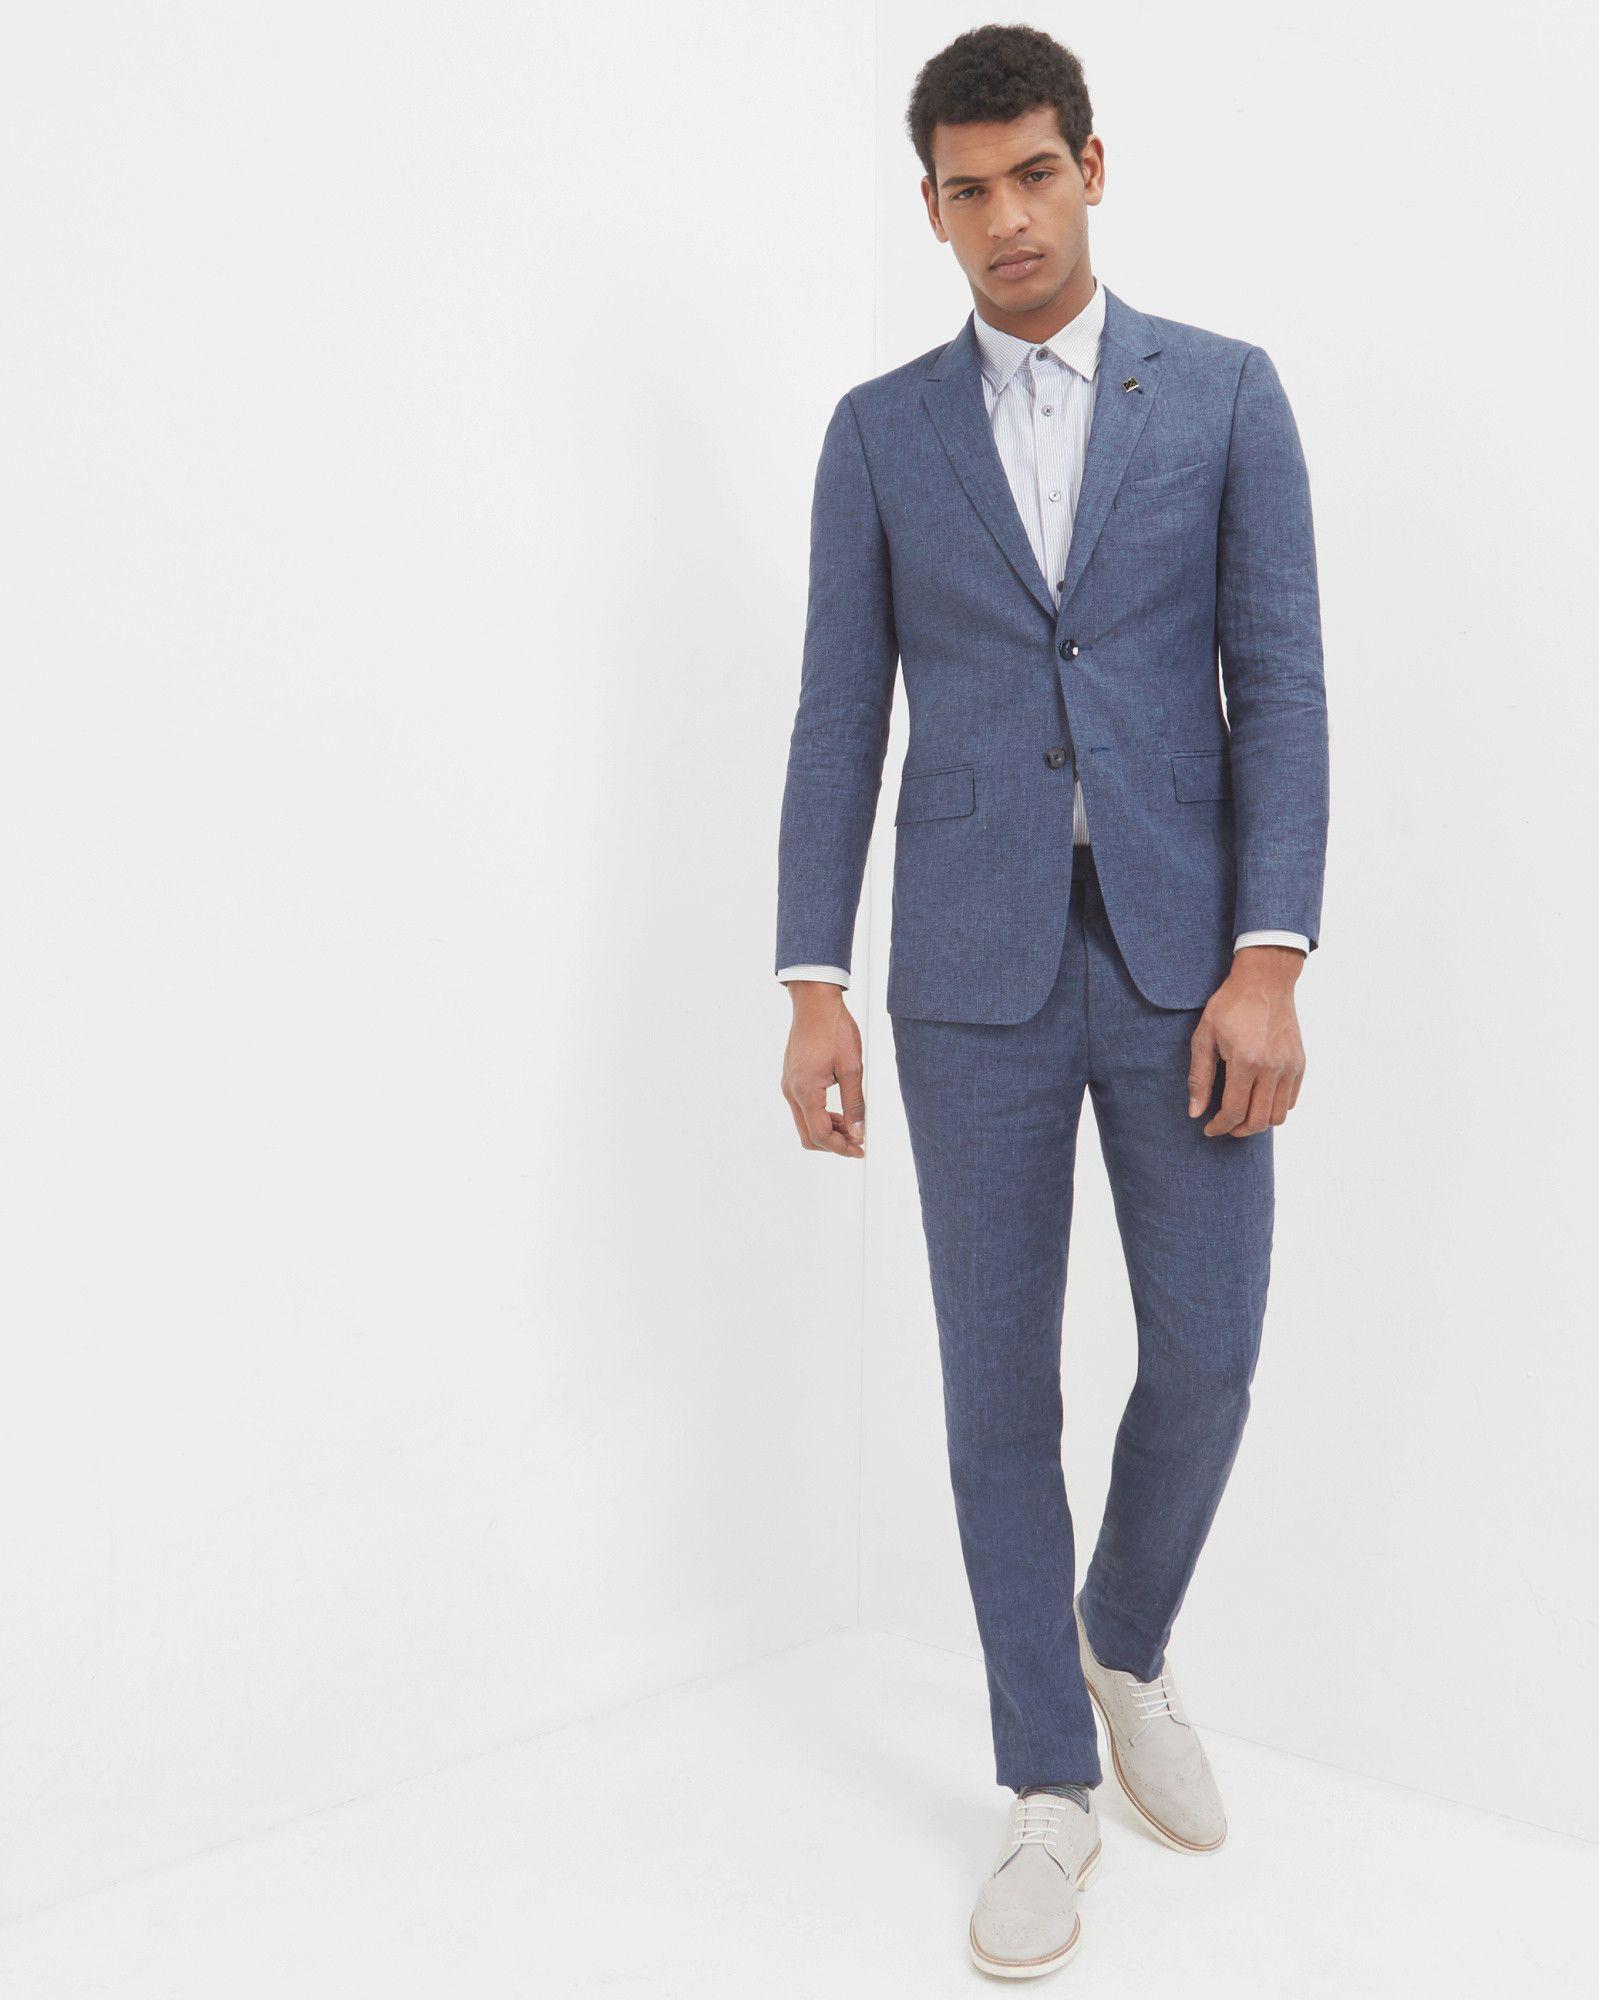 6e588d102869 Debonair linen jacket - Light Blue